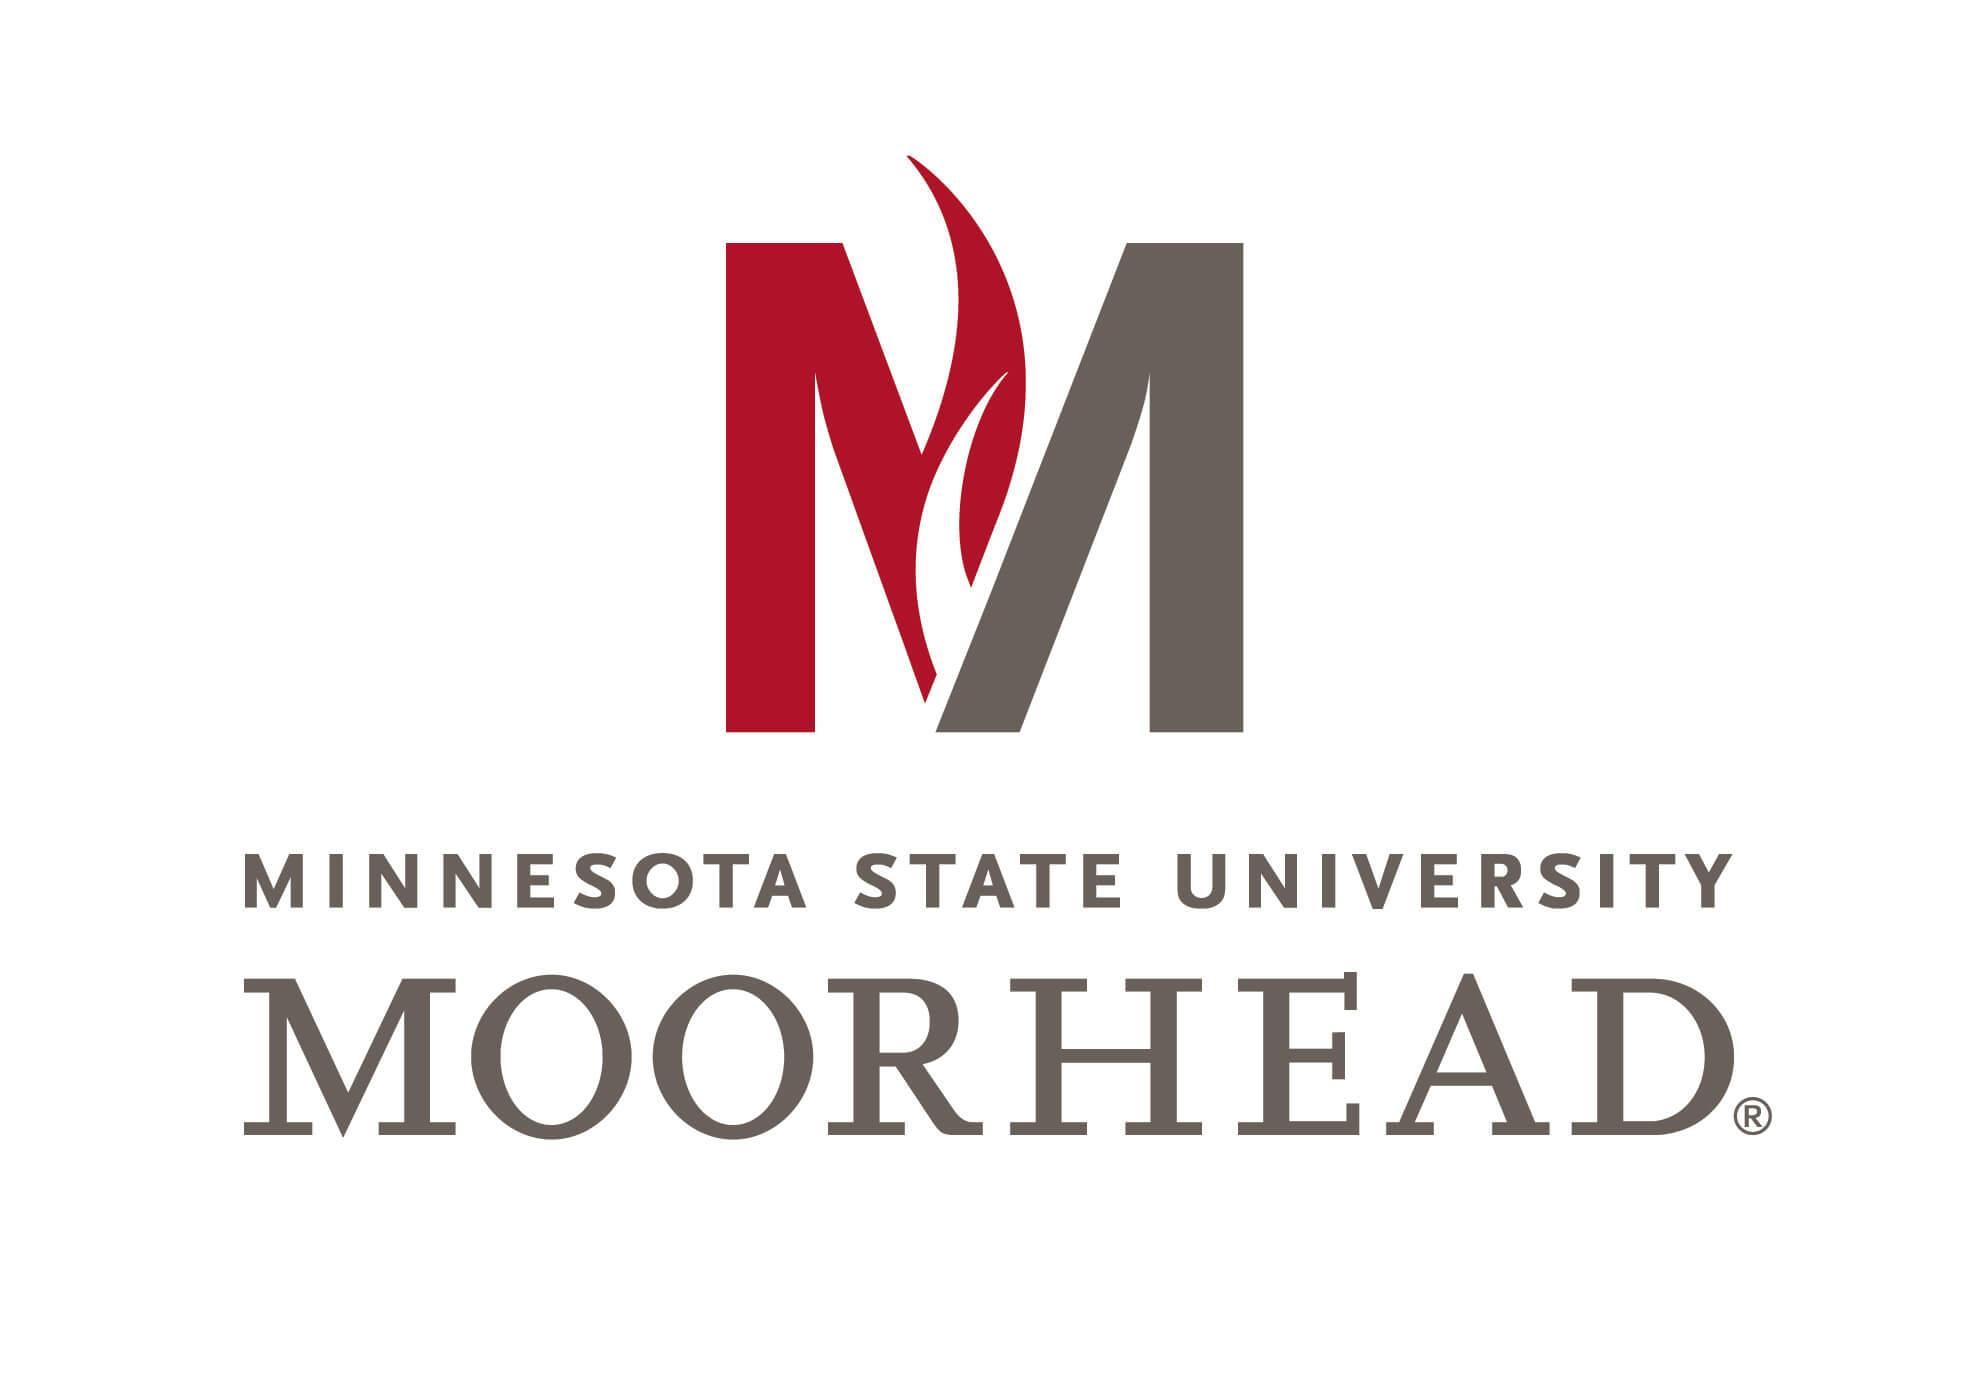 Minnesota State University Moorhead logo.